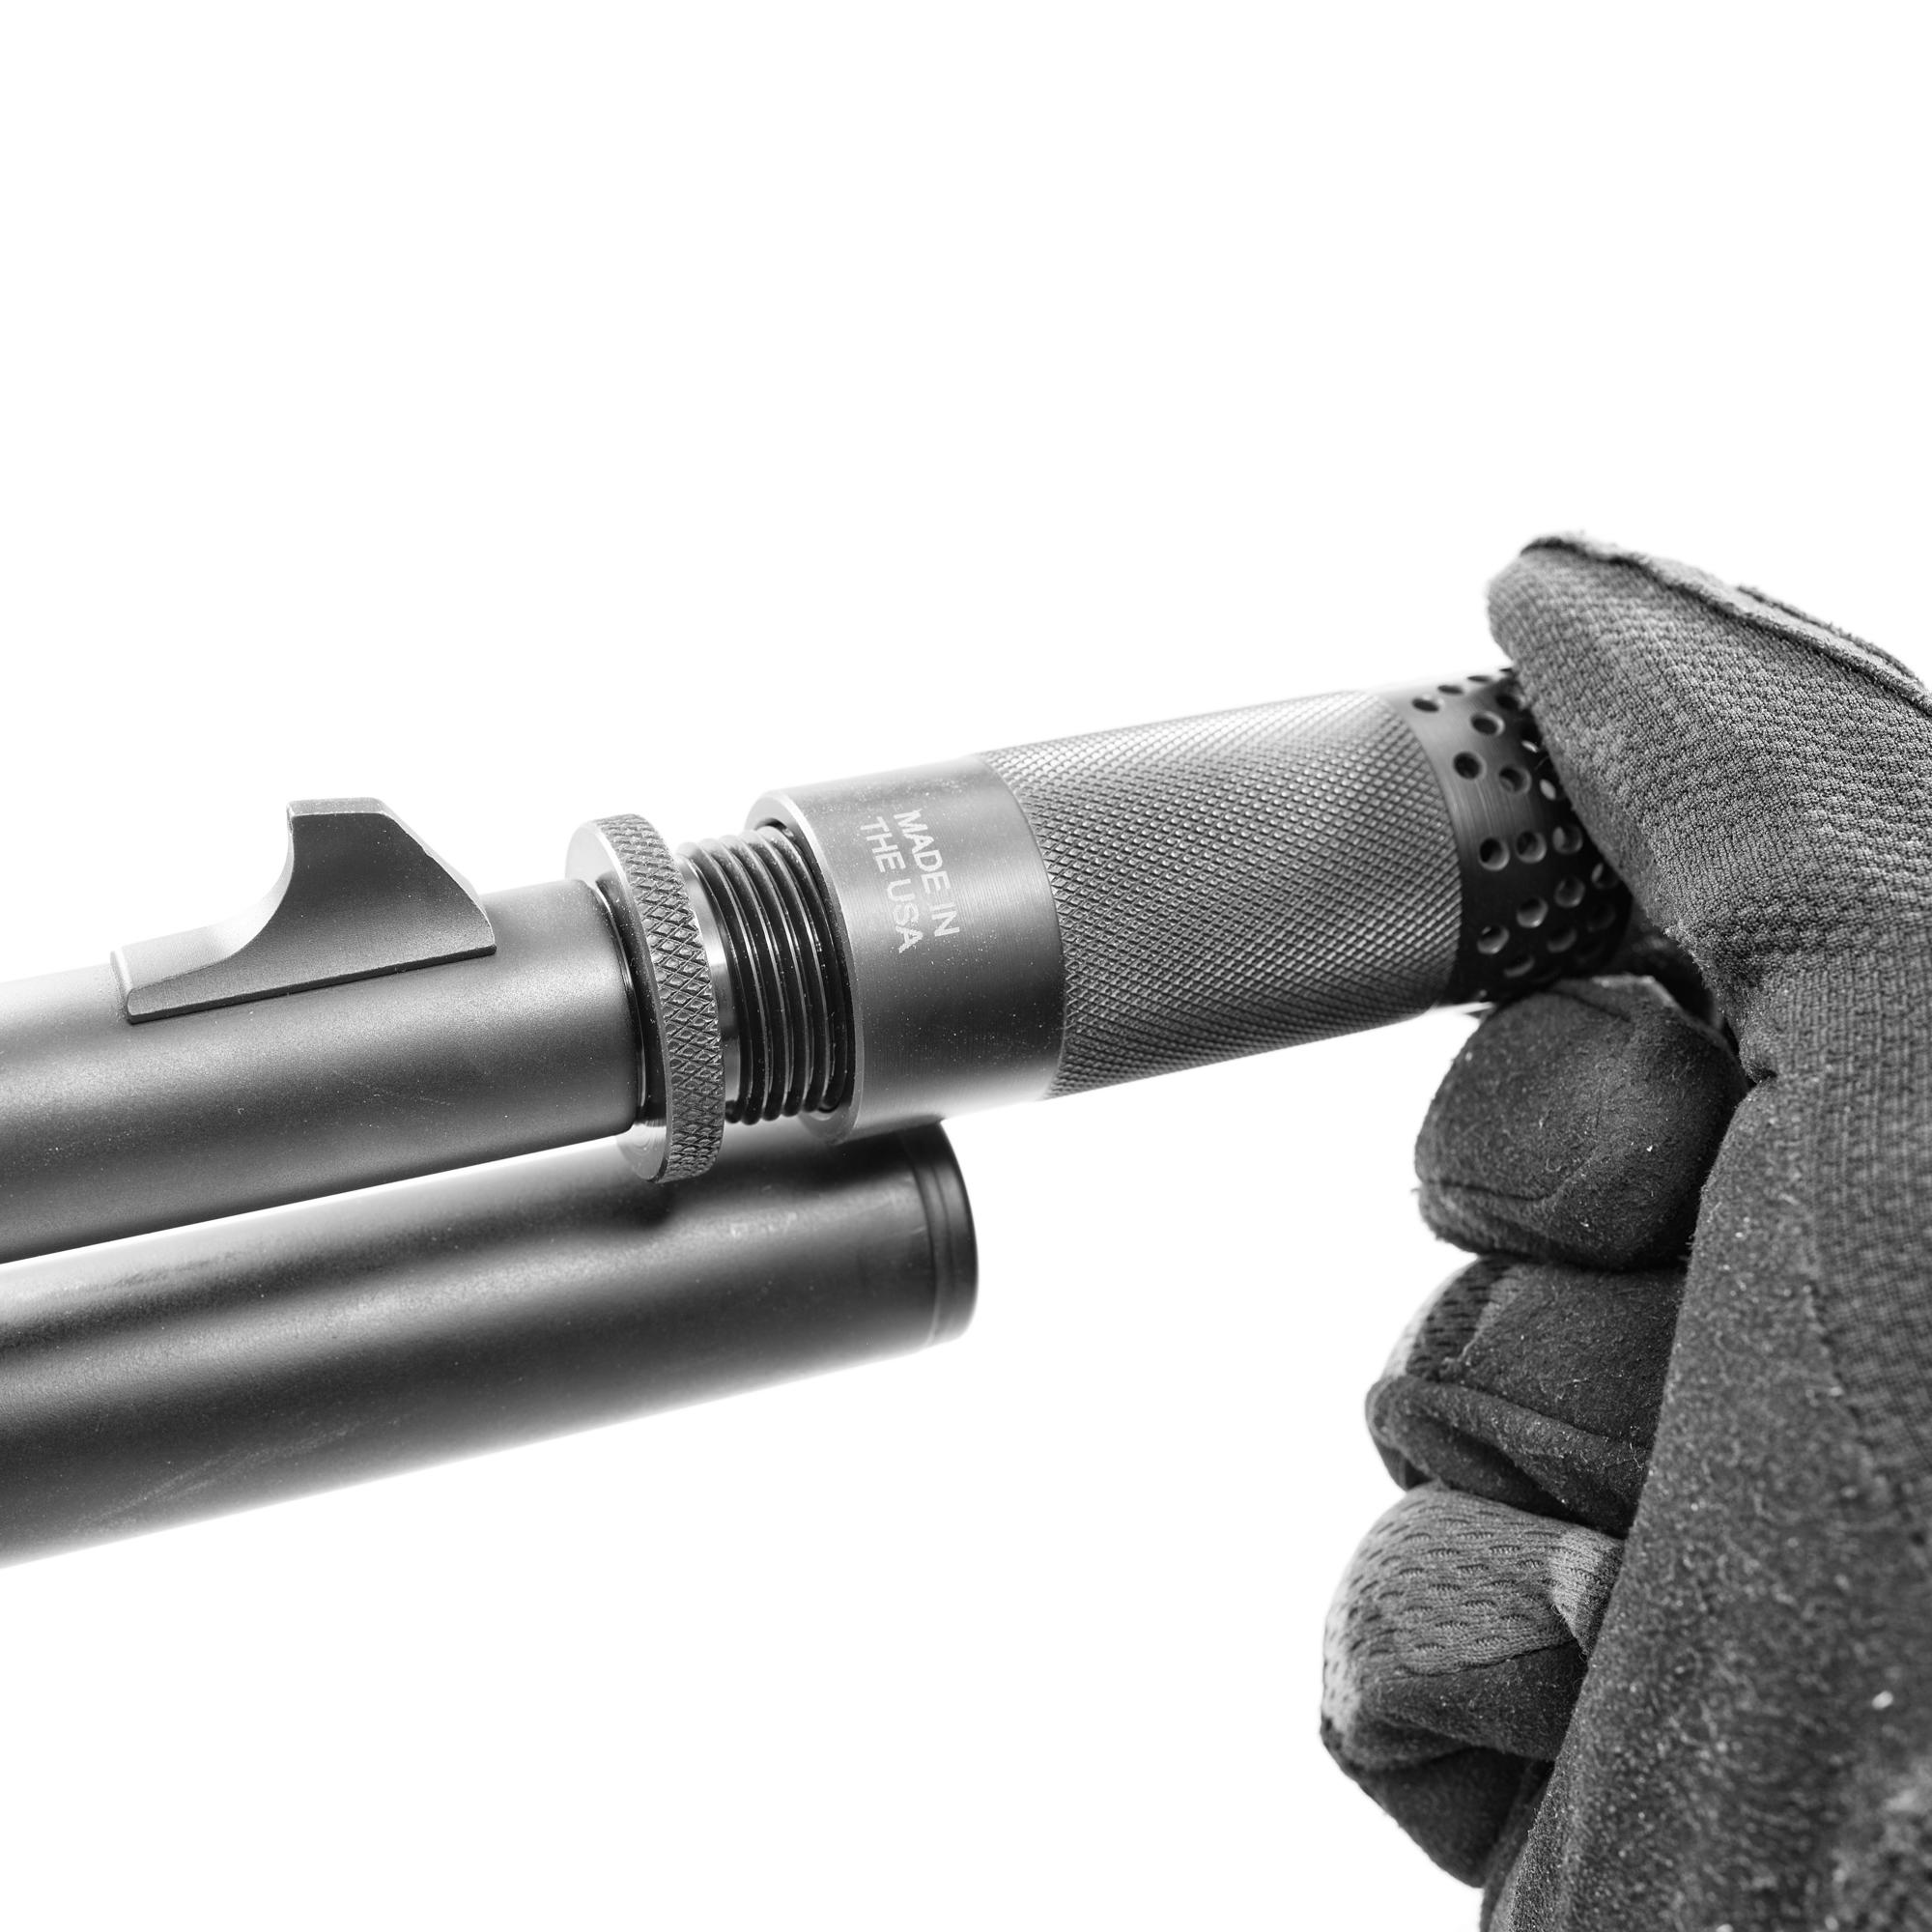 1-14 Threaded 12 Gauge Shotgun Choke Tube Muzzle Brake Shroud Adapter